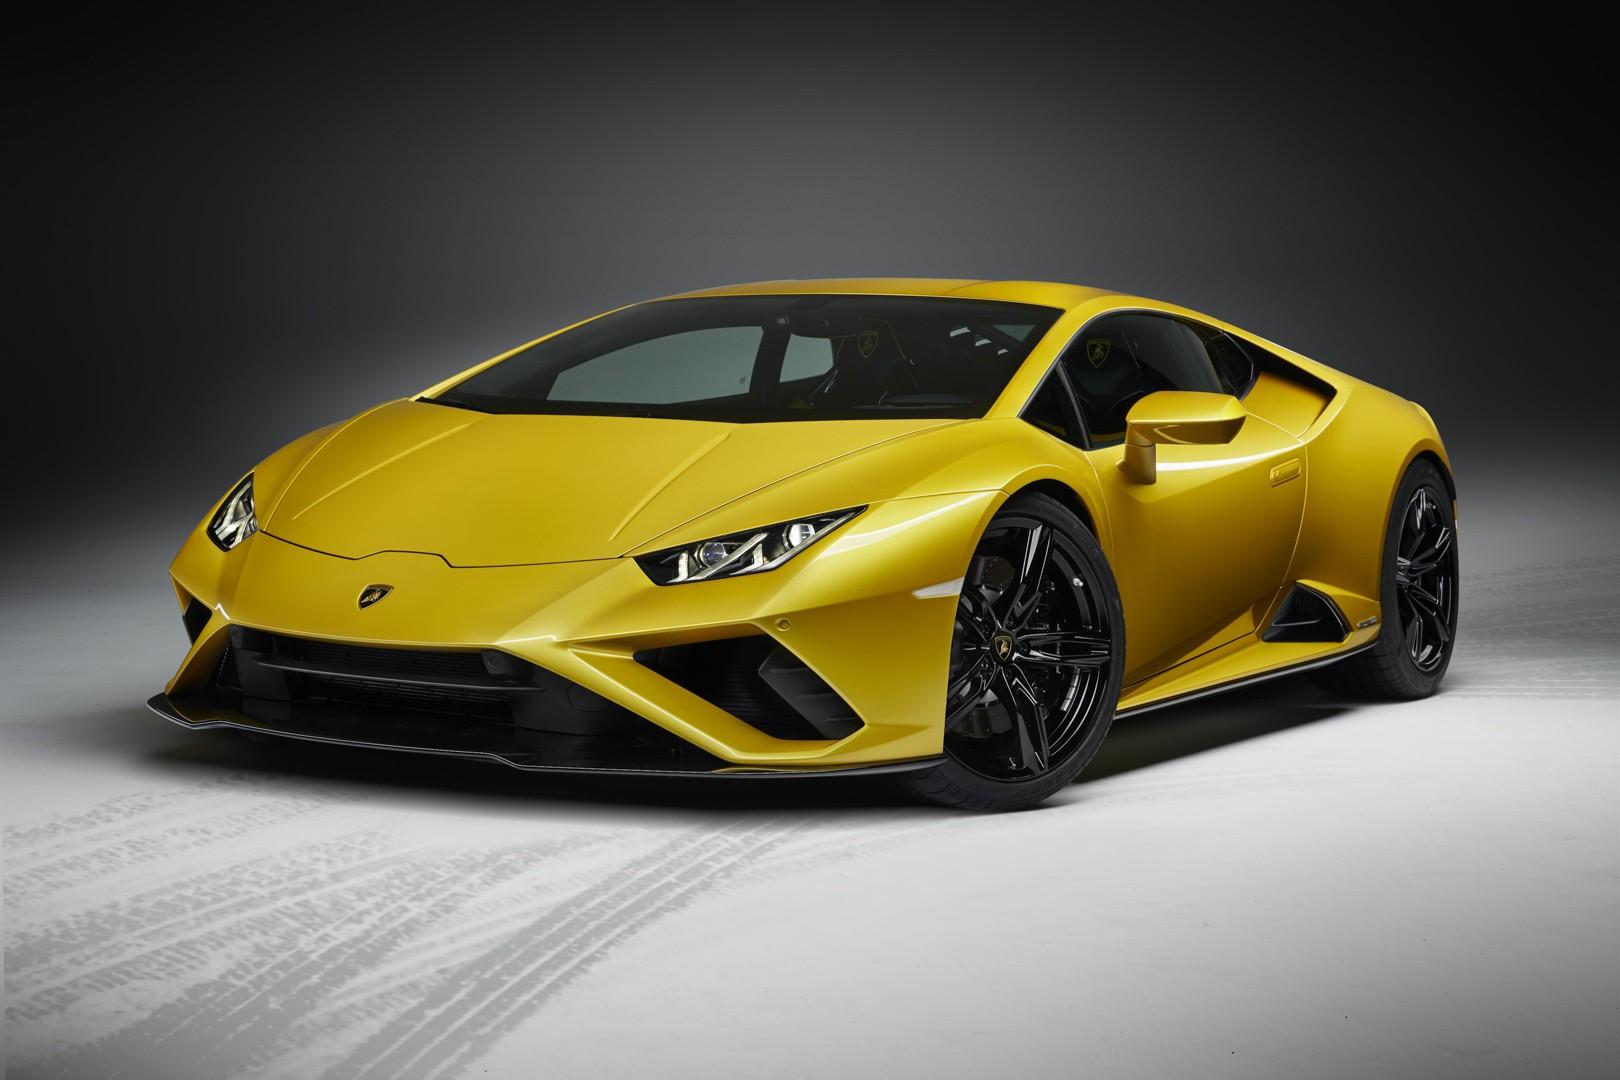 Hình ảnh xe Lamborghini huracan